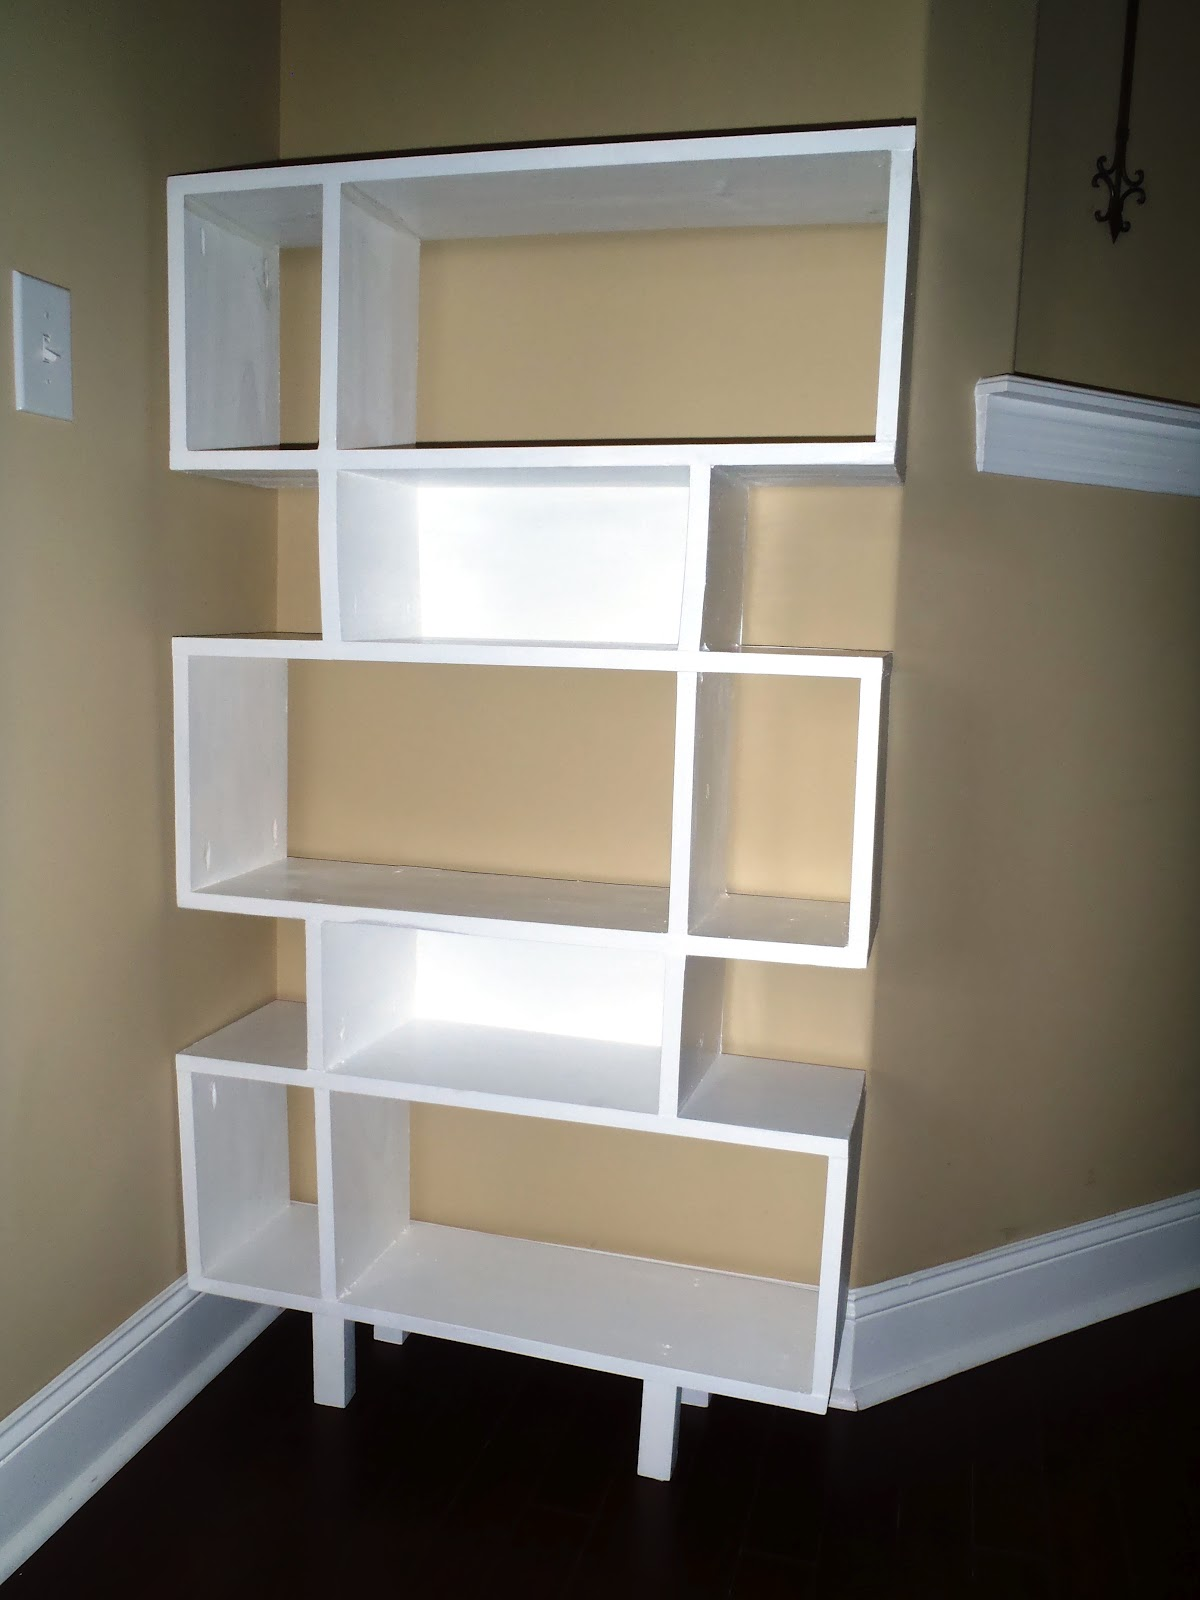 Lazy Liz On Less: Simple Modern Shelf